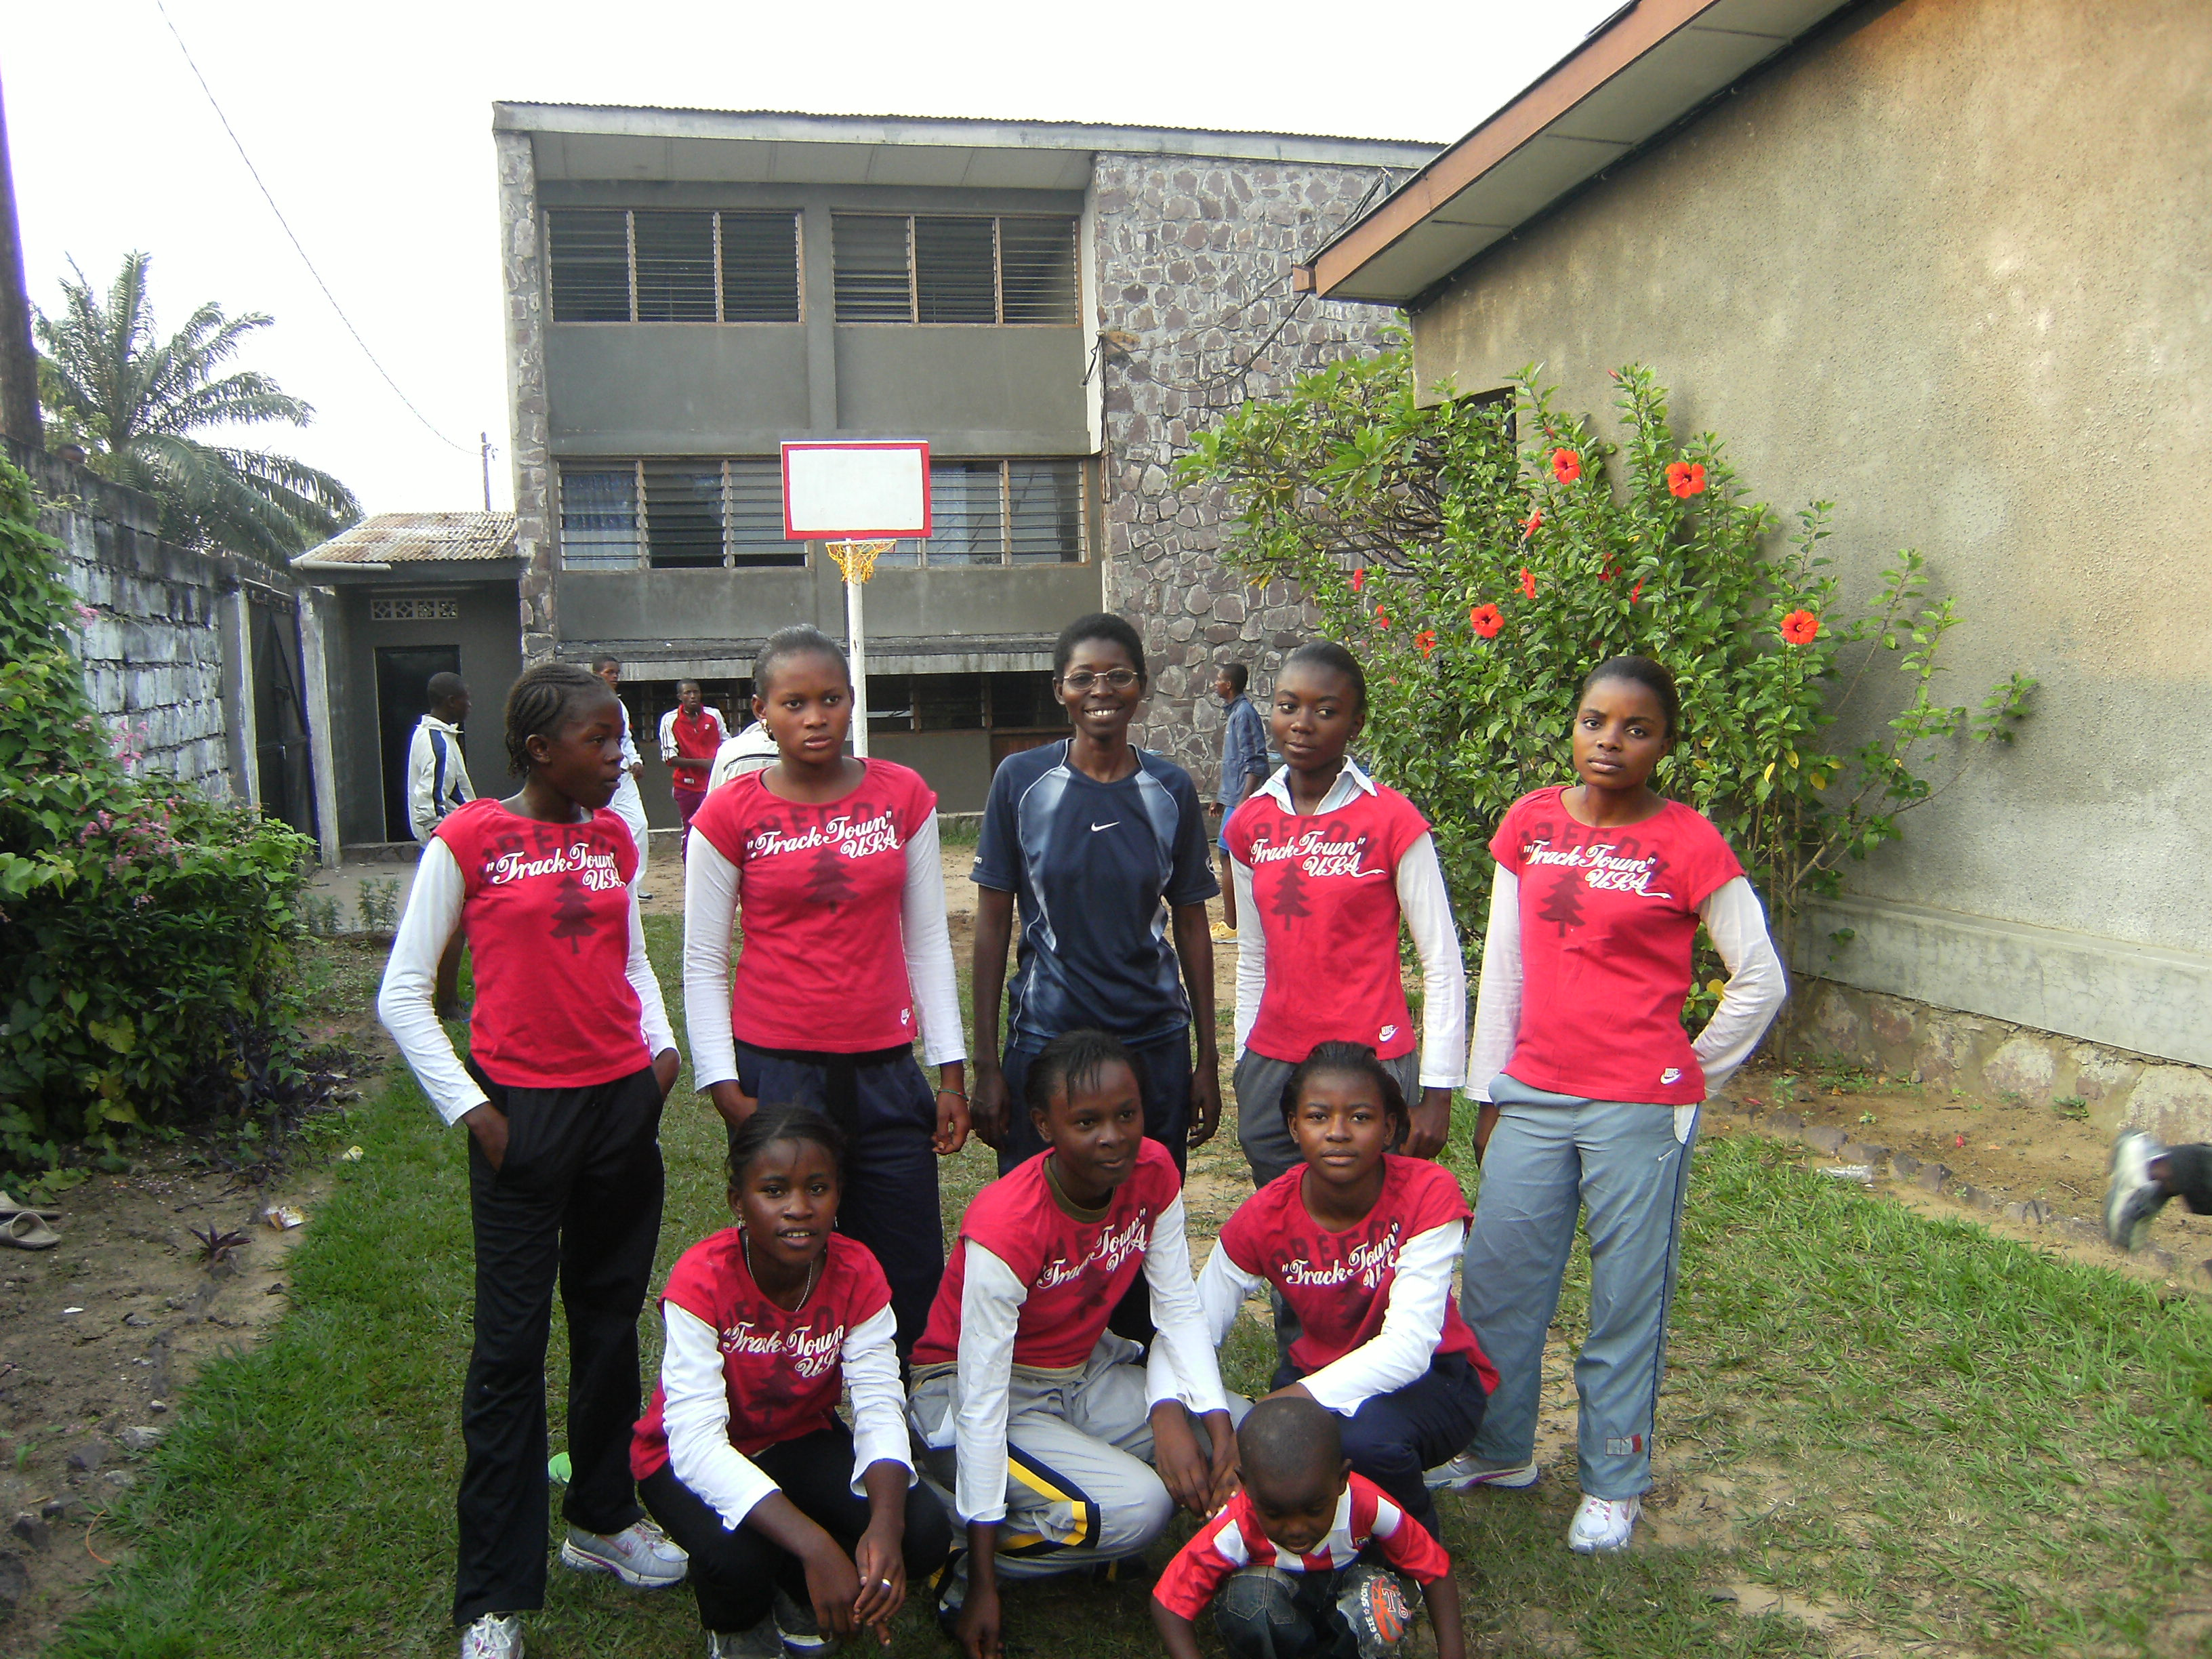 Alumnas de Secundaria practicando deporte